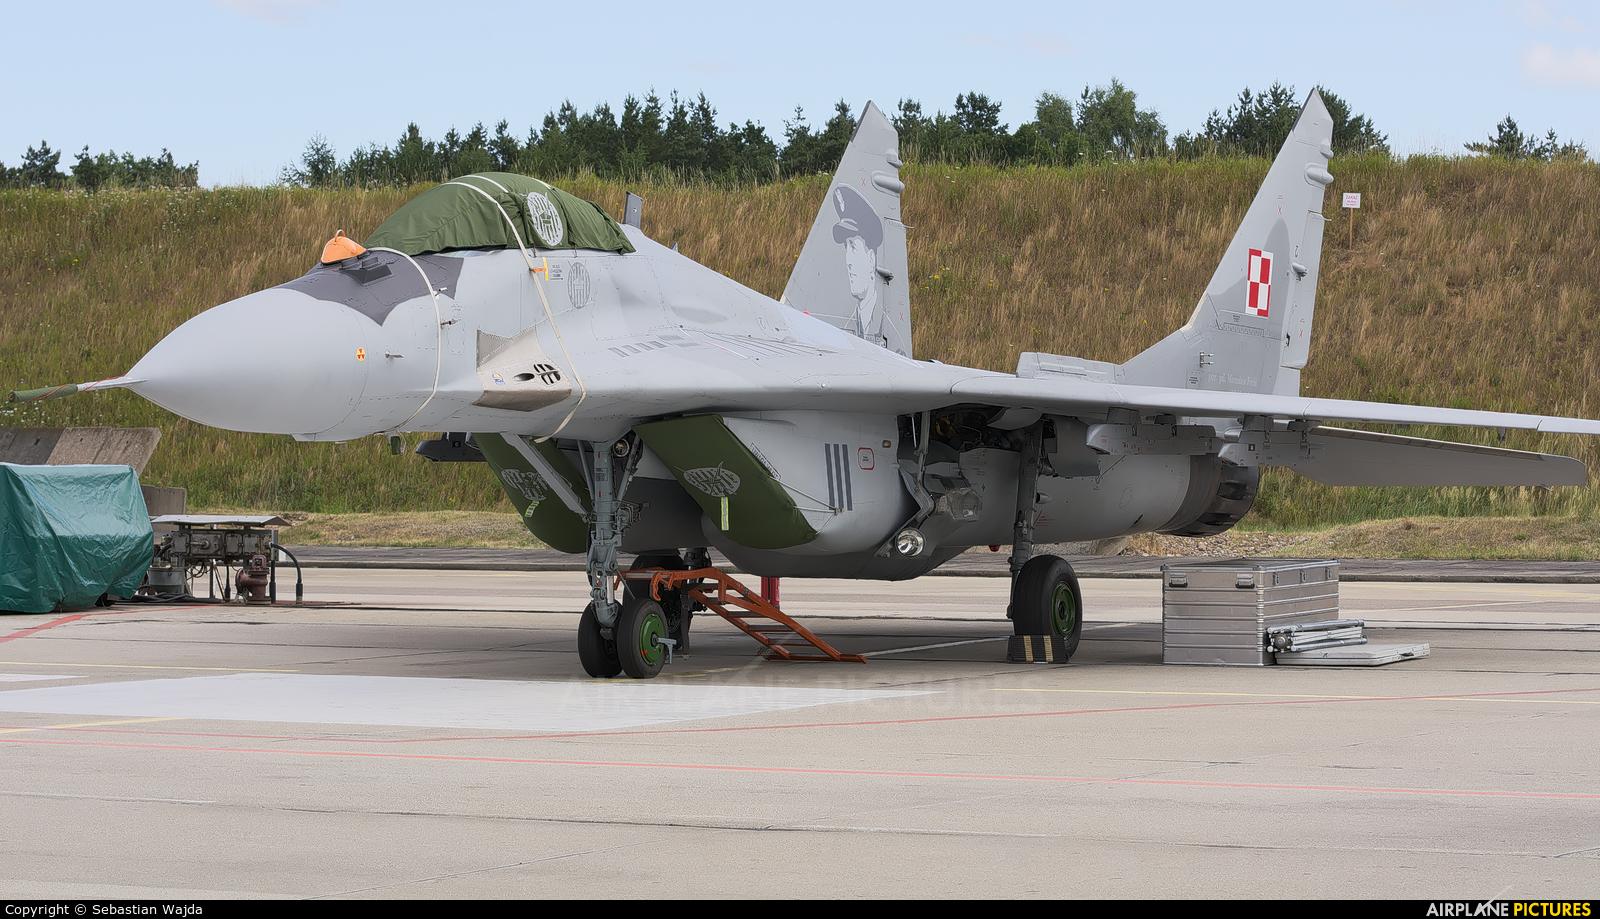 Poland - Air Force 111 aircraft at Świdwin